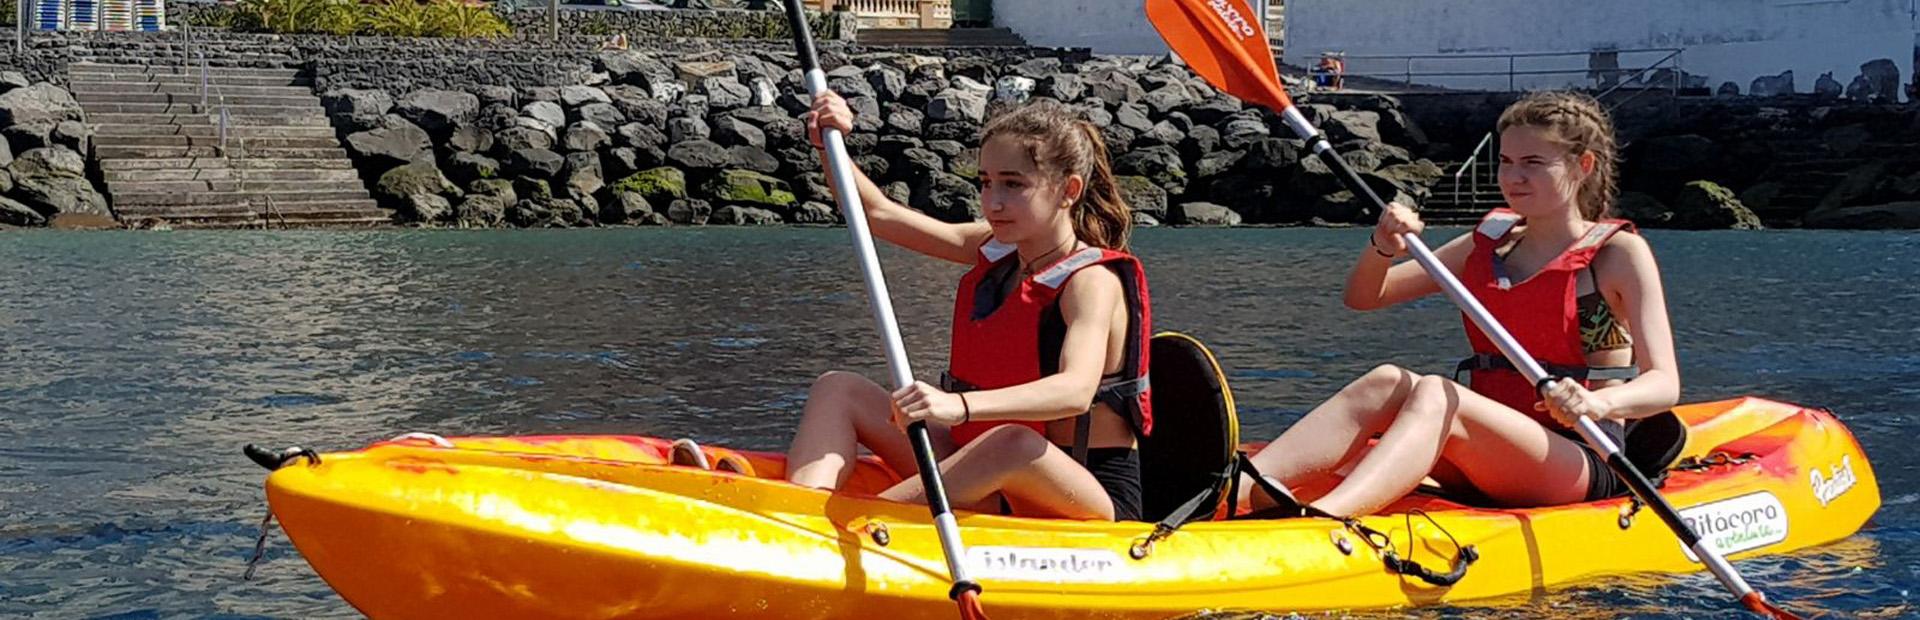 jornada nautico para colegios